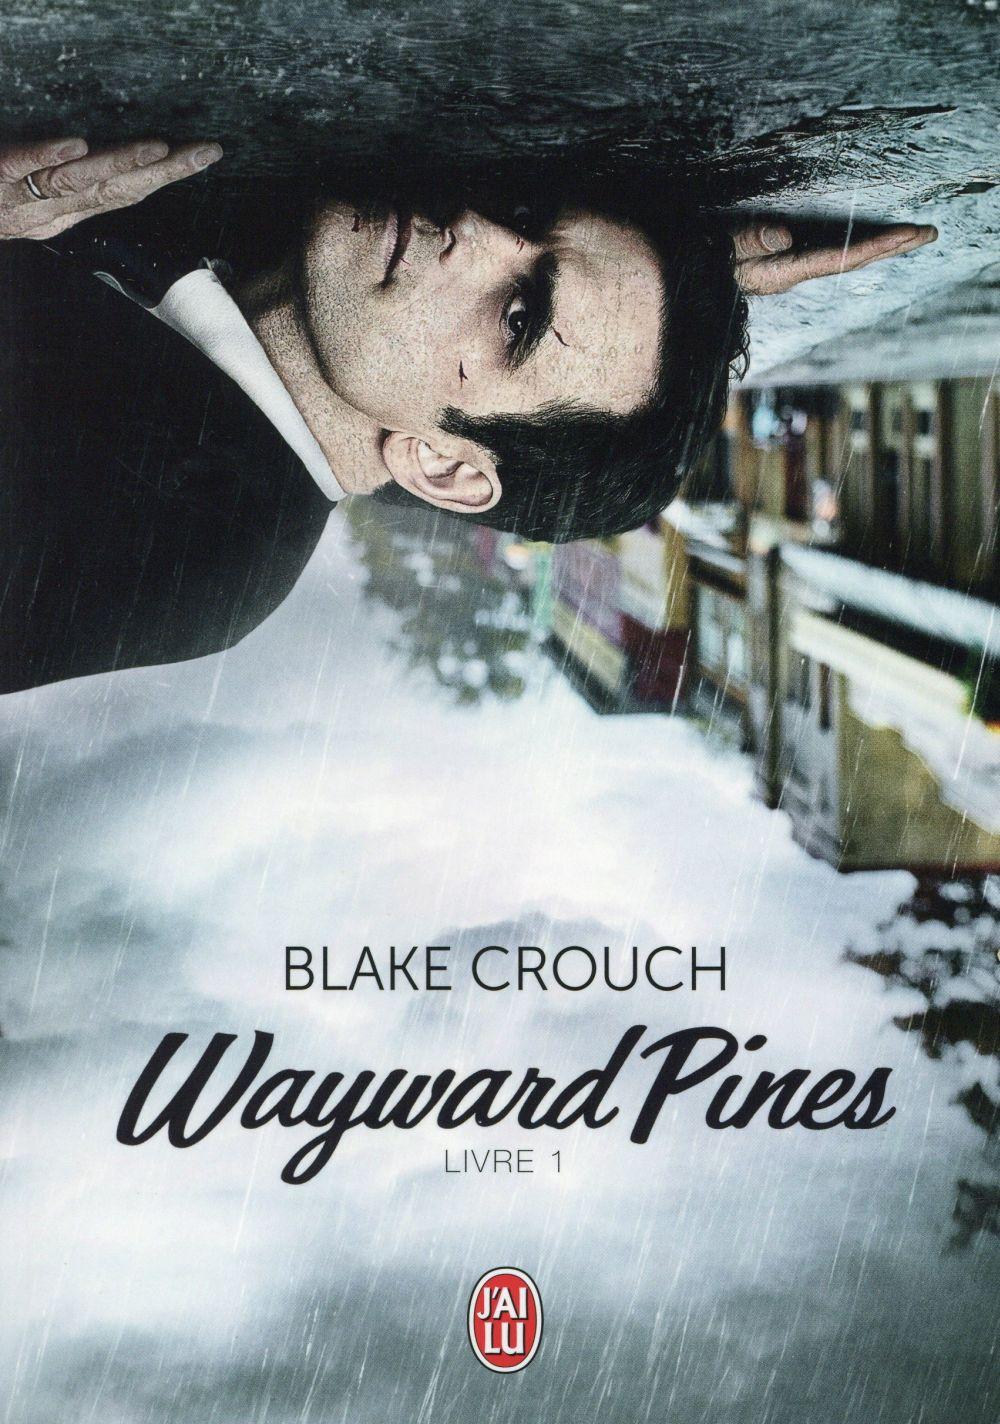 Wayward pines t. 1